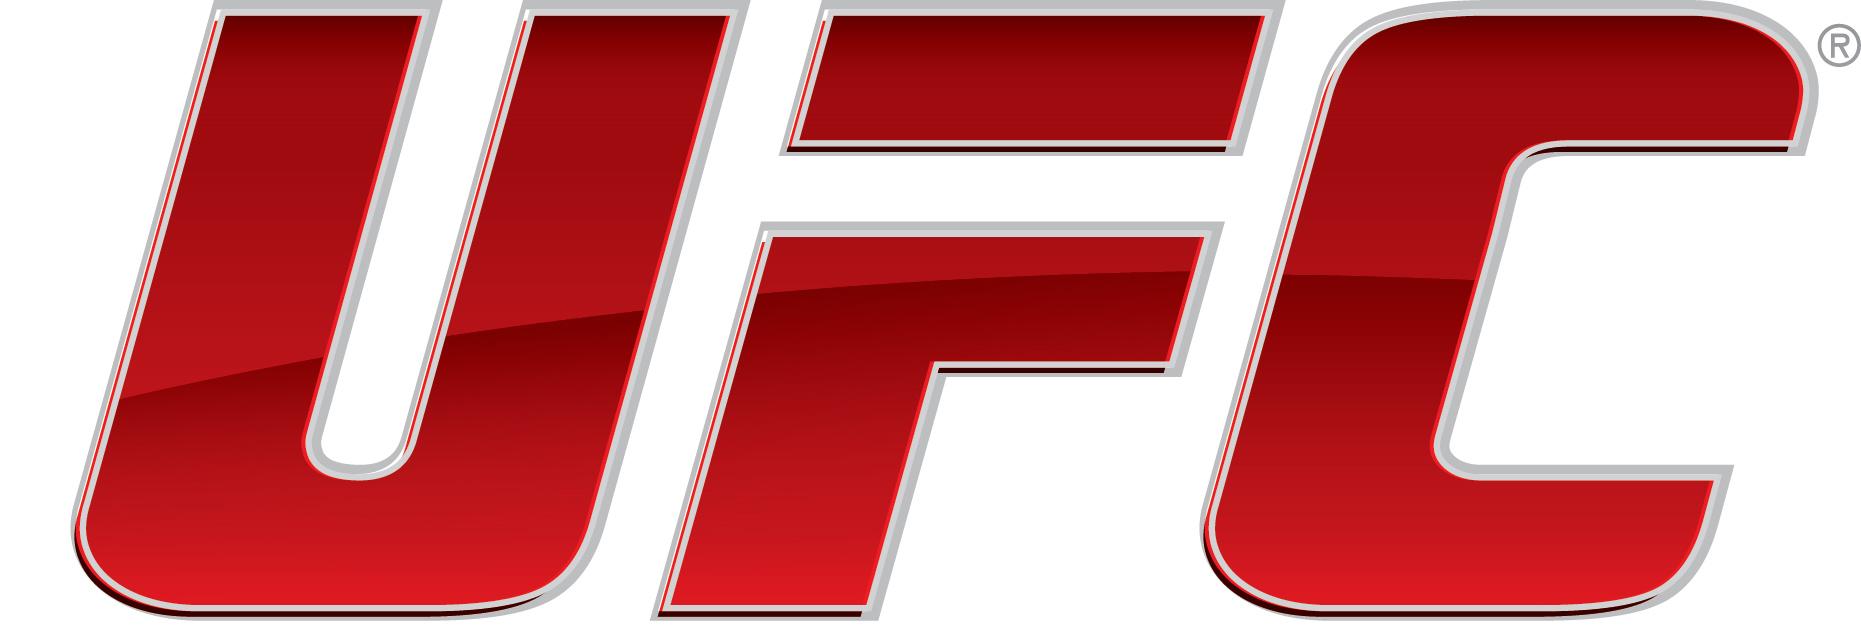 ufc png transparent ufc png images pluspng rh pluspng com ufc logo png ufc logo images